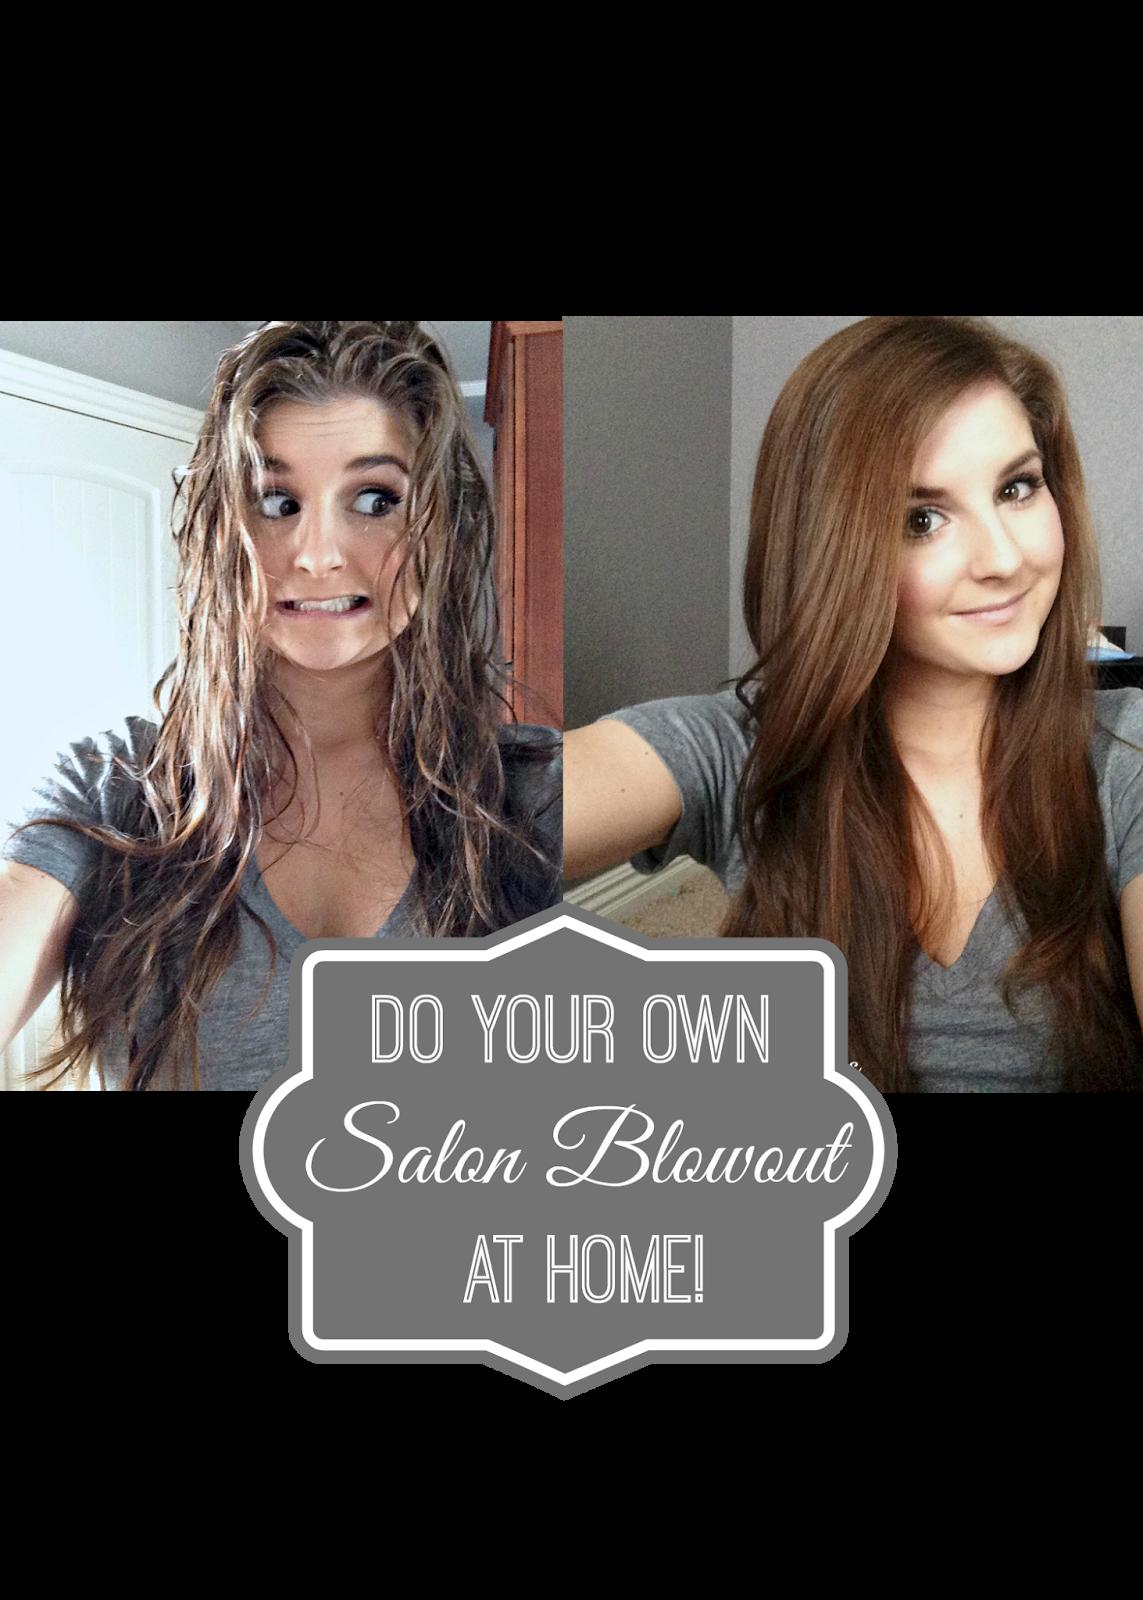 rose co blog diy salon blowout at home